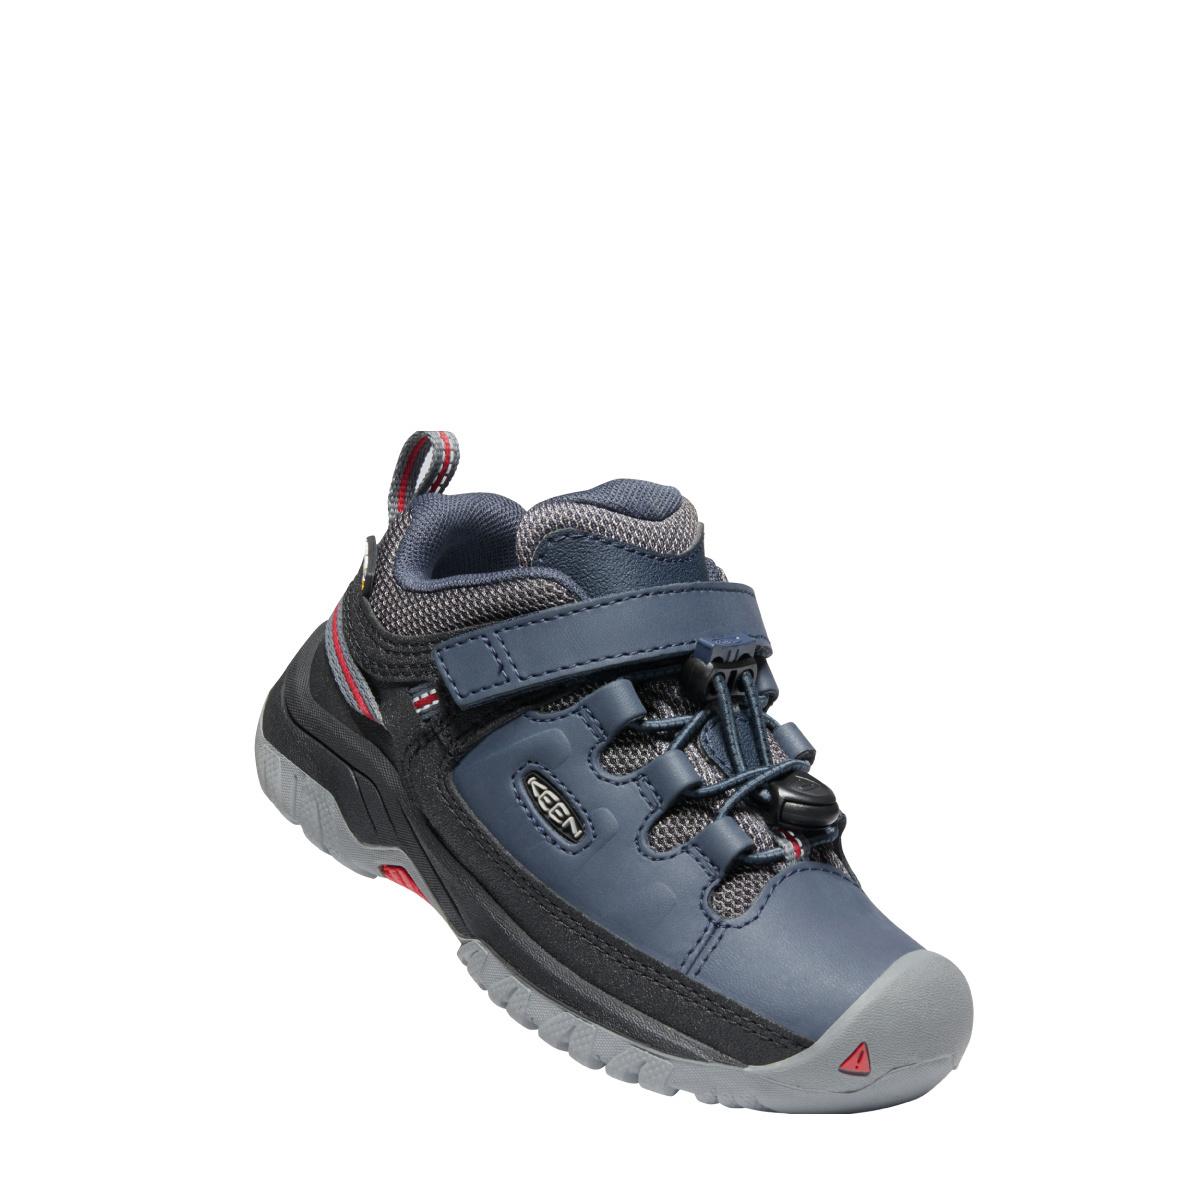 Keen Footwear Keen Kids/Youth Targhee Low Blue Nights/Red Carpet